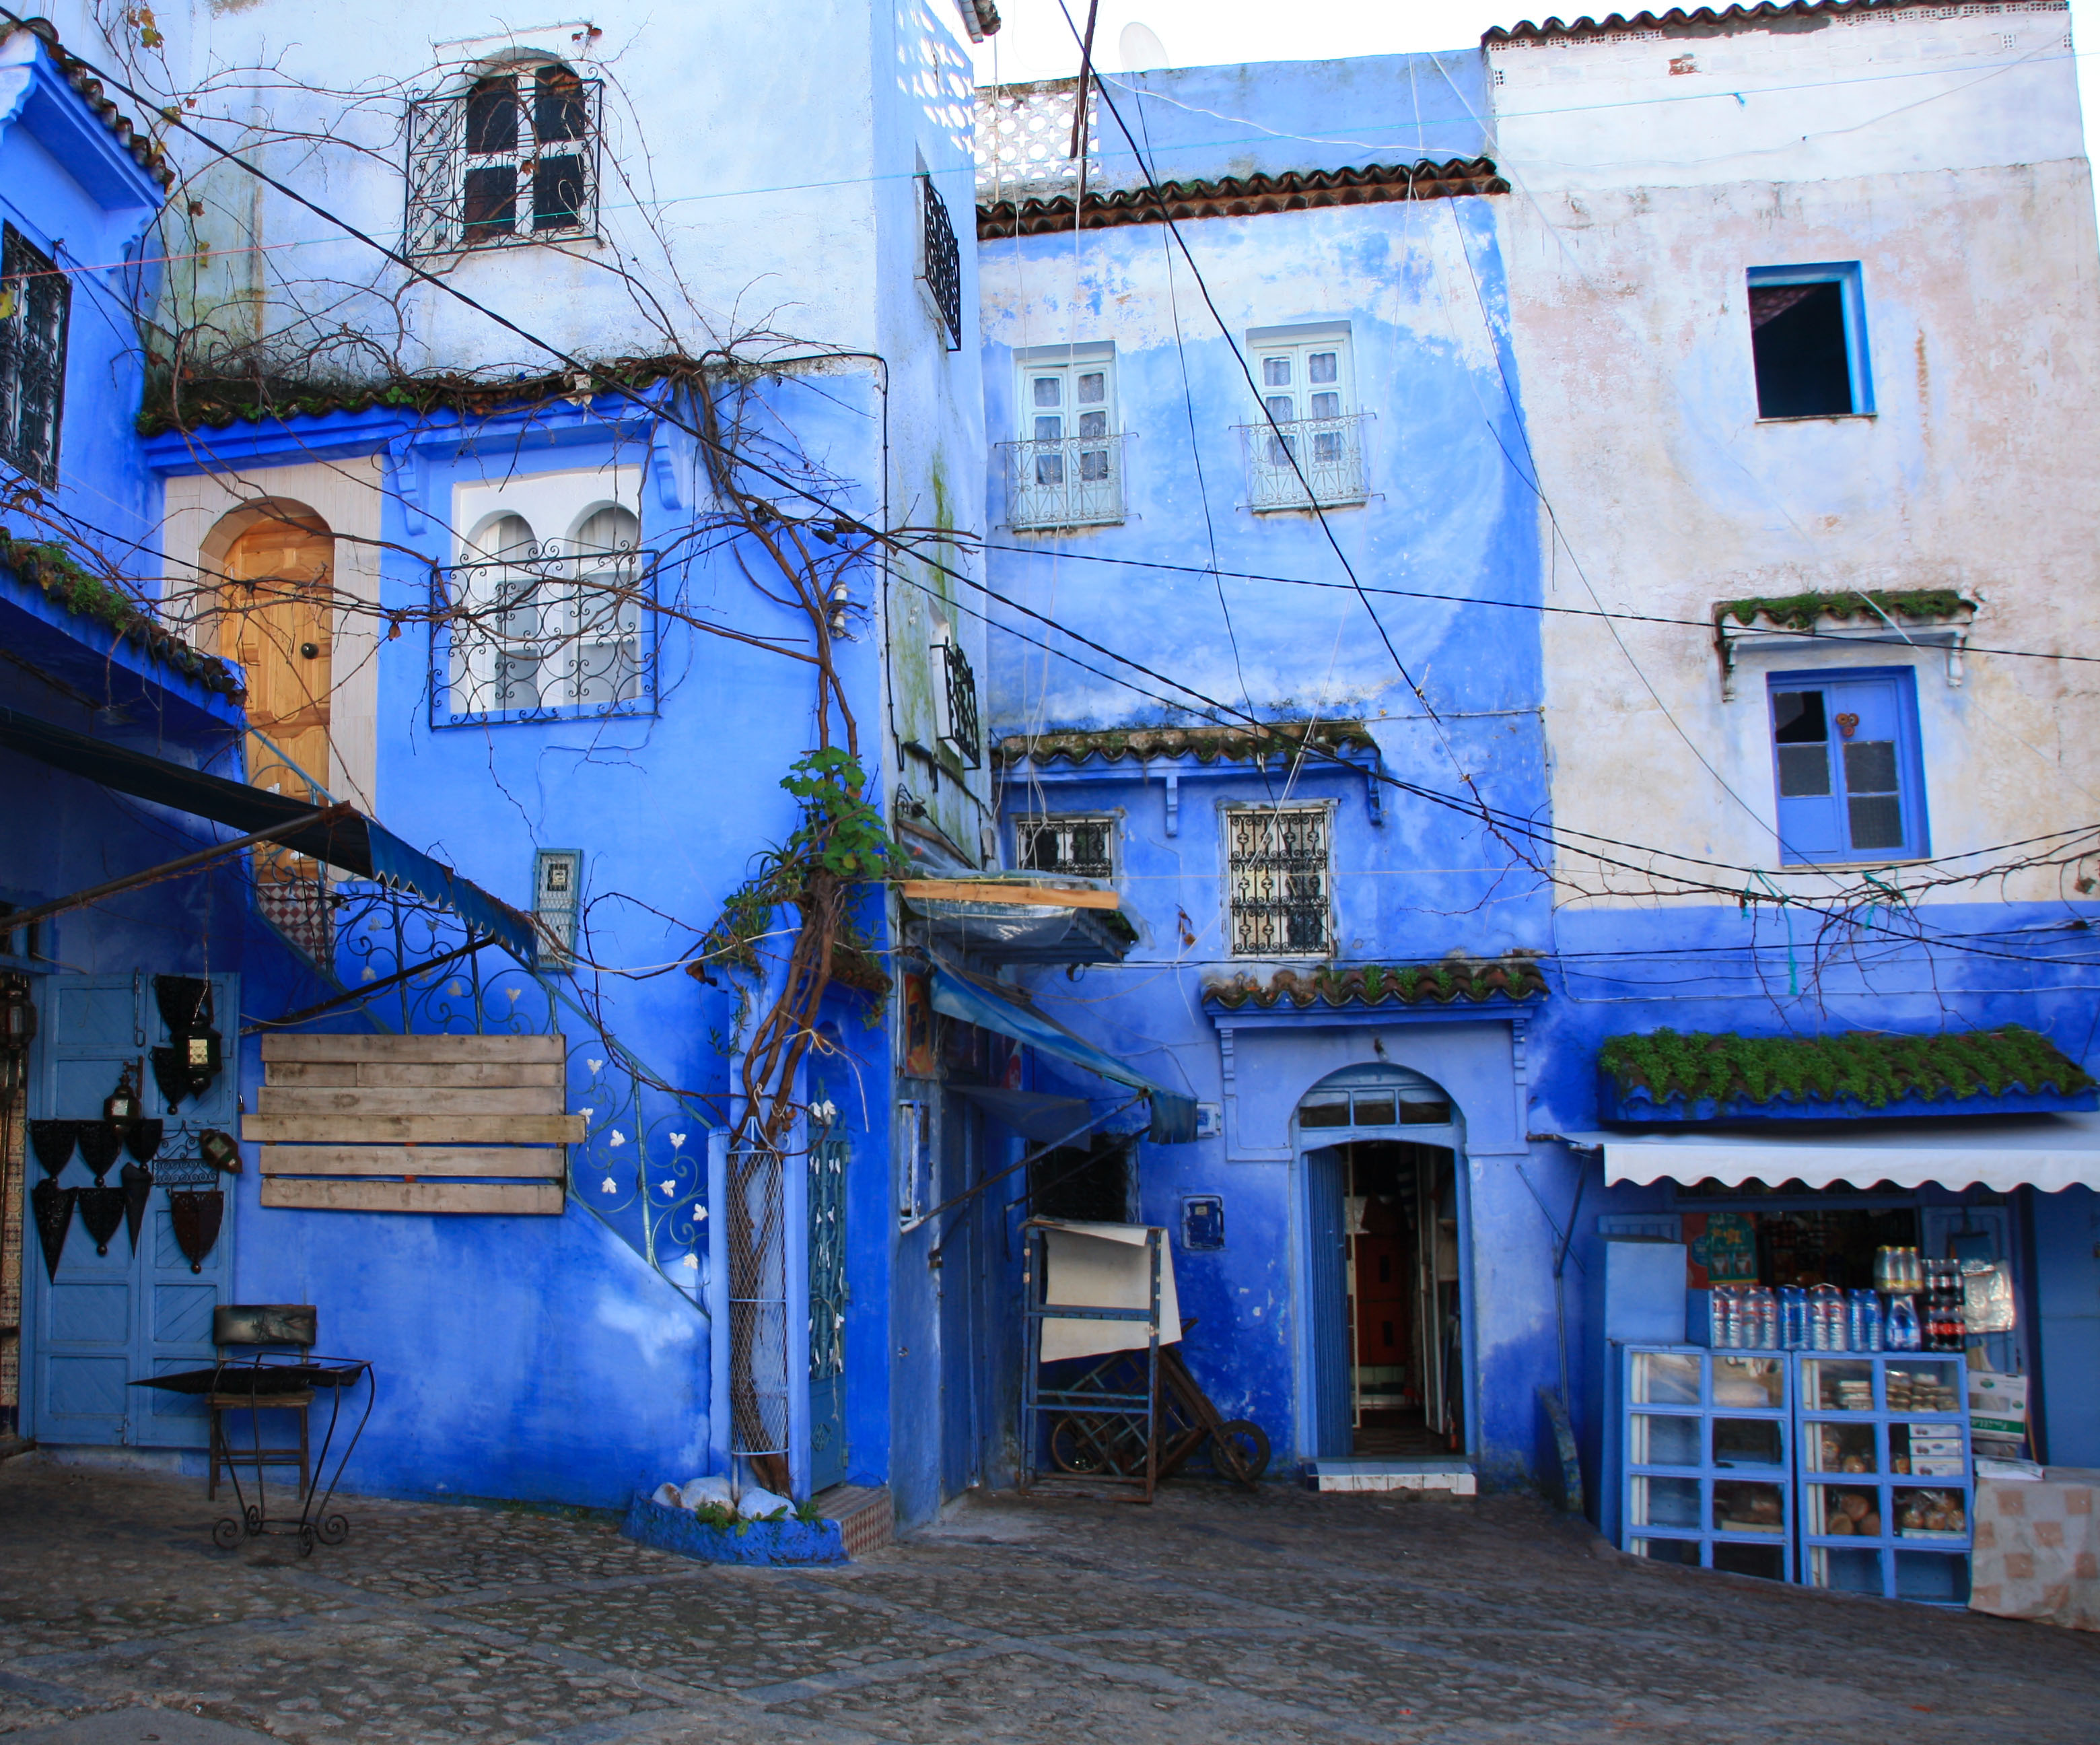 Chefchaouen, Morocco. Photo taken January 1, 2000.